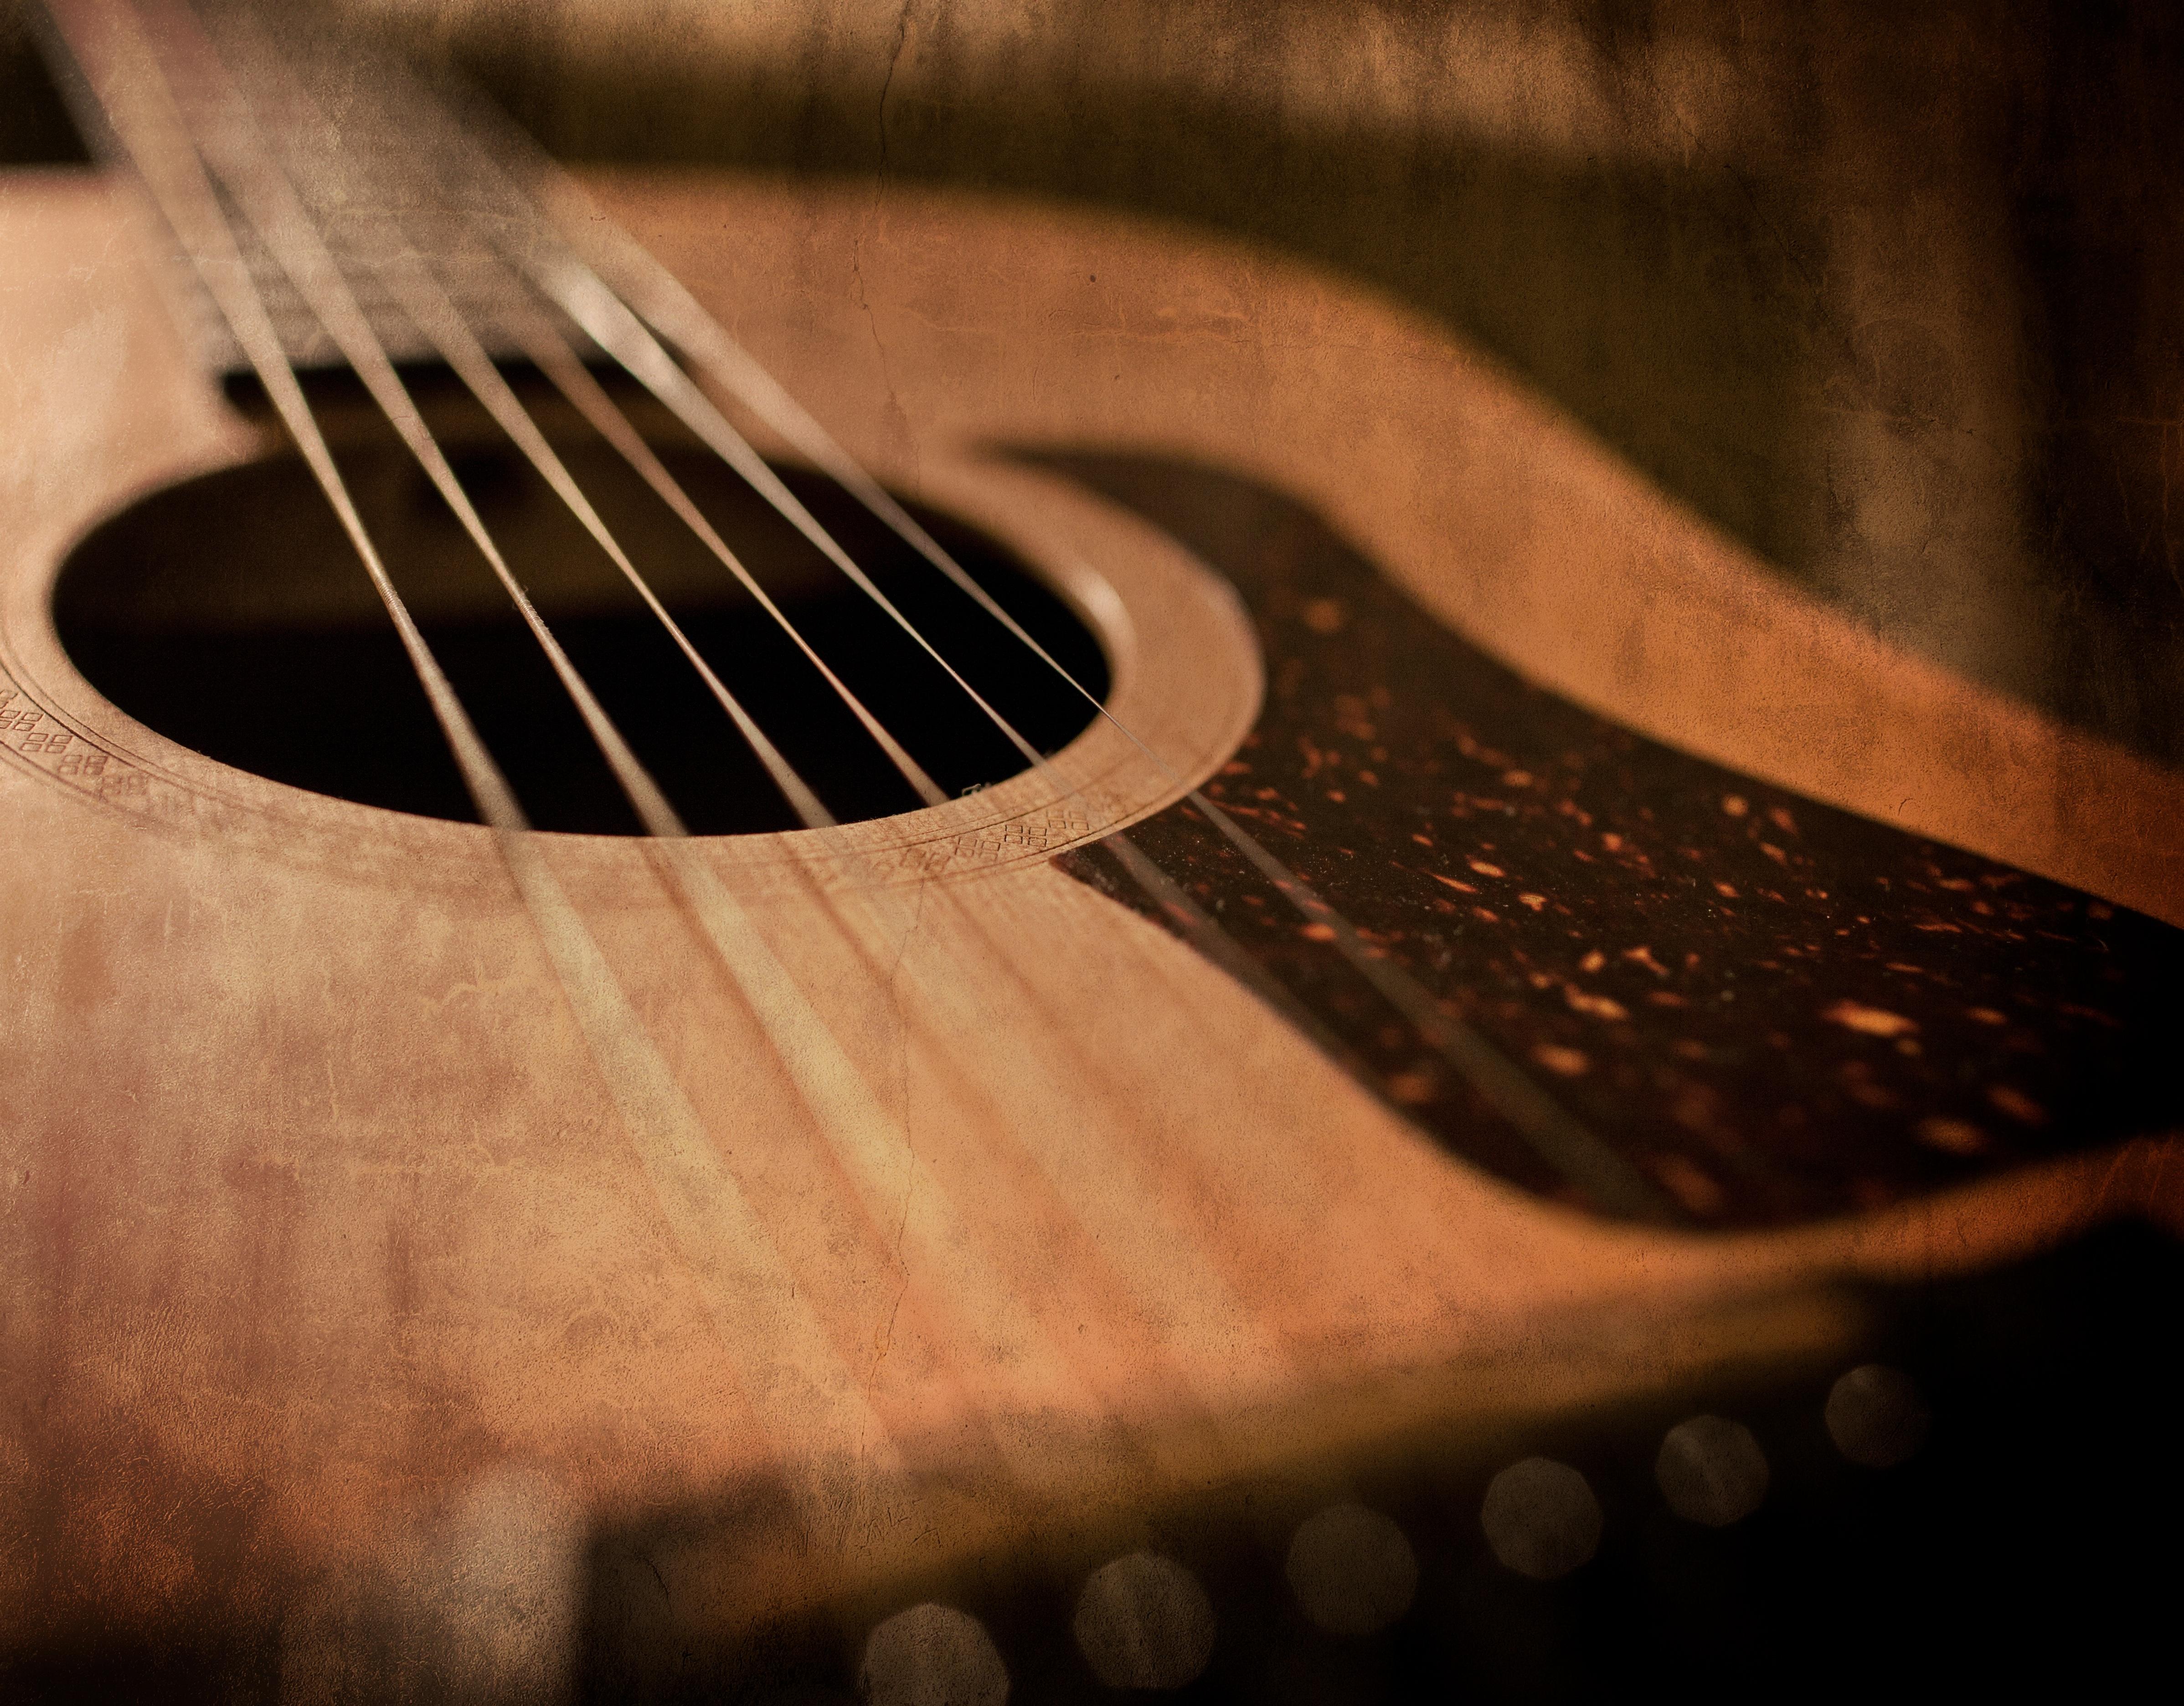 Картинки гитара с надписями, картинки про романа